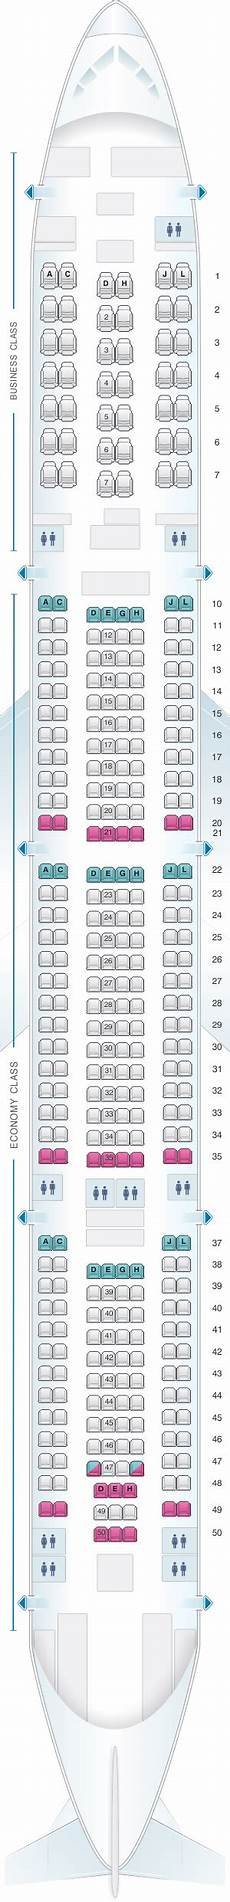 Iberia 2622 Seating Chart Seat Map Iberia Airbus A340 600 342pax Map Airplane